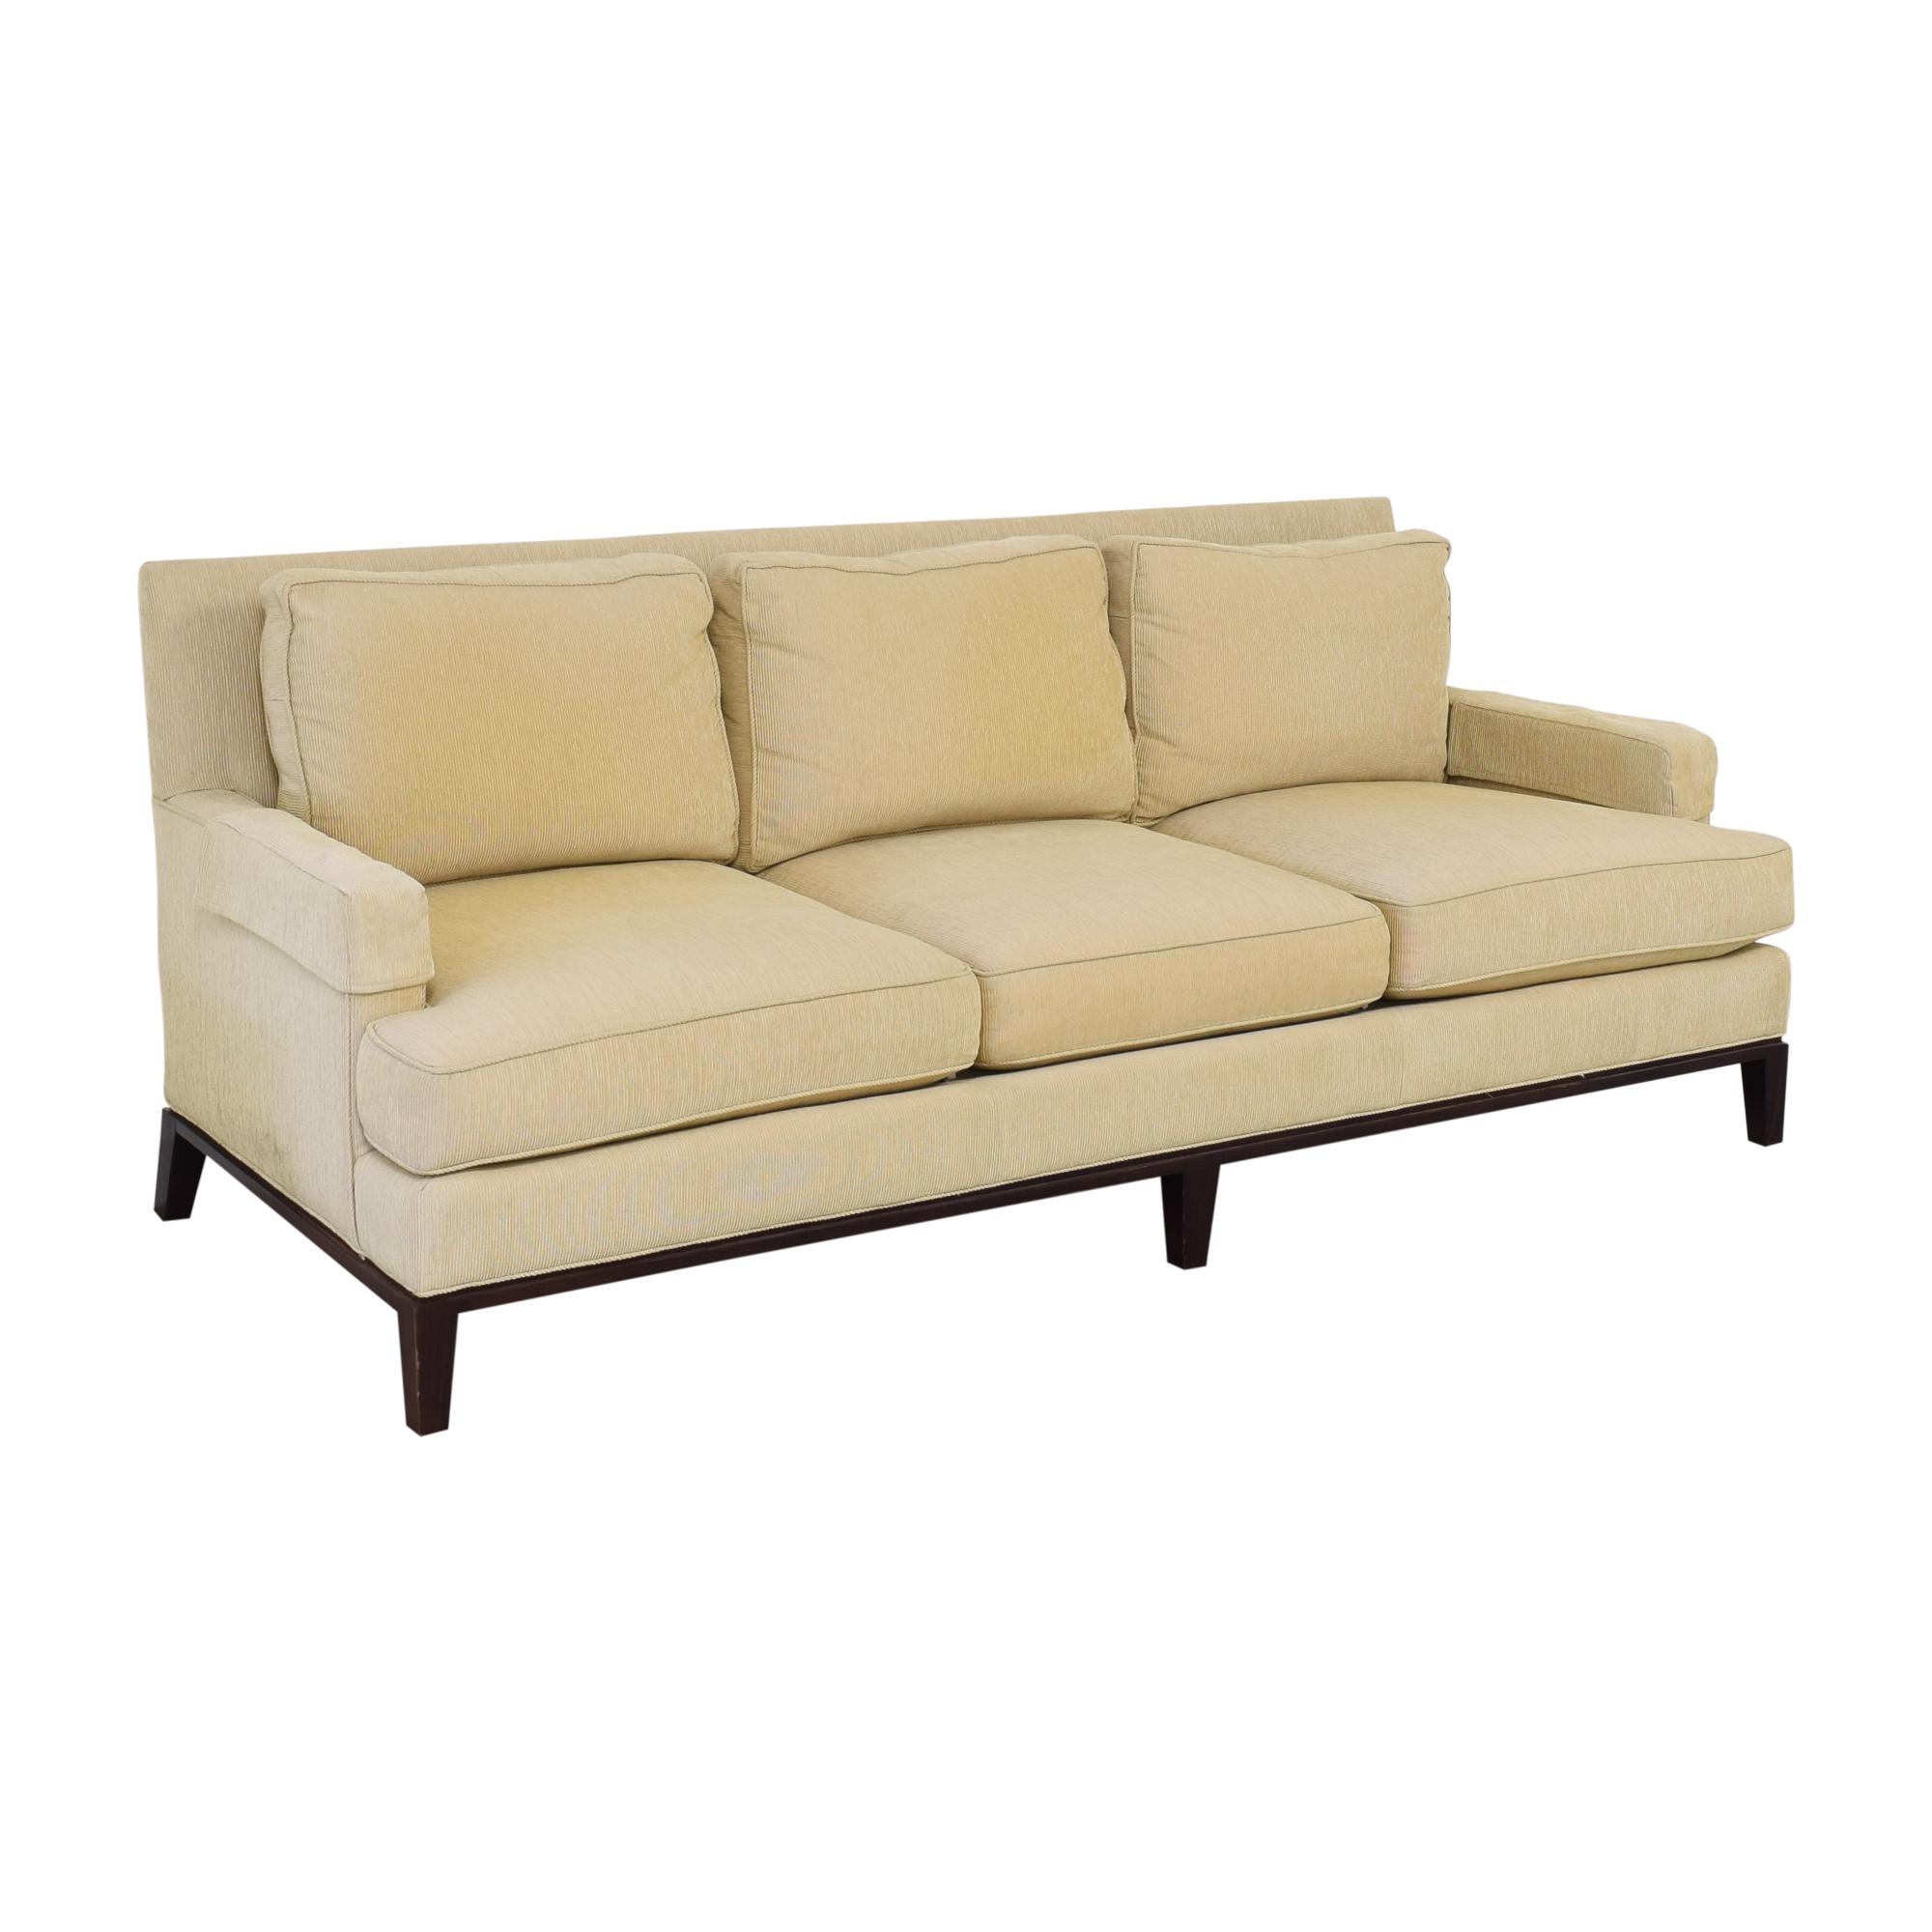 Vanguard Furniture Vanguard Furniture Sterling Sofa price